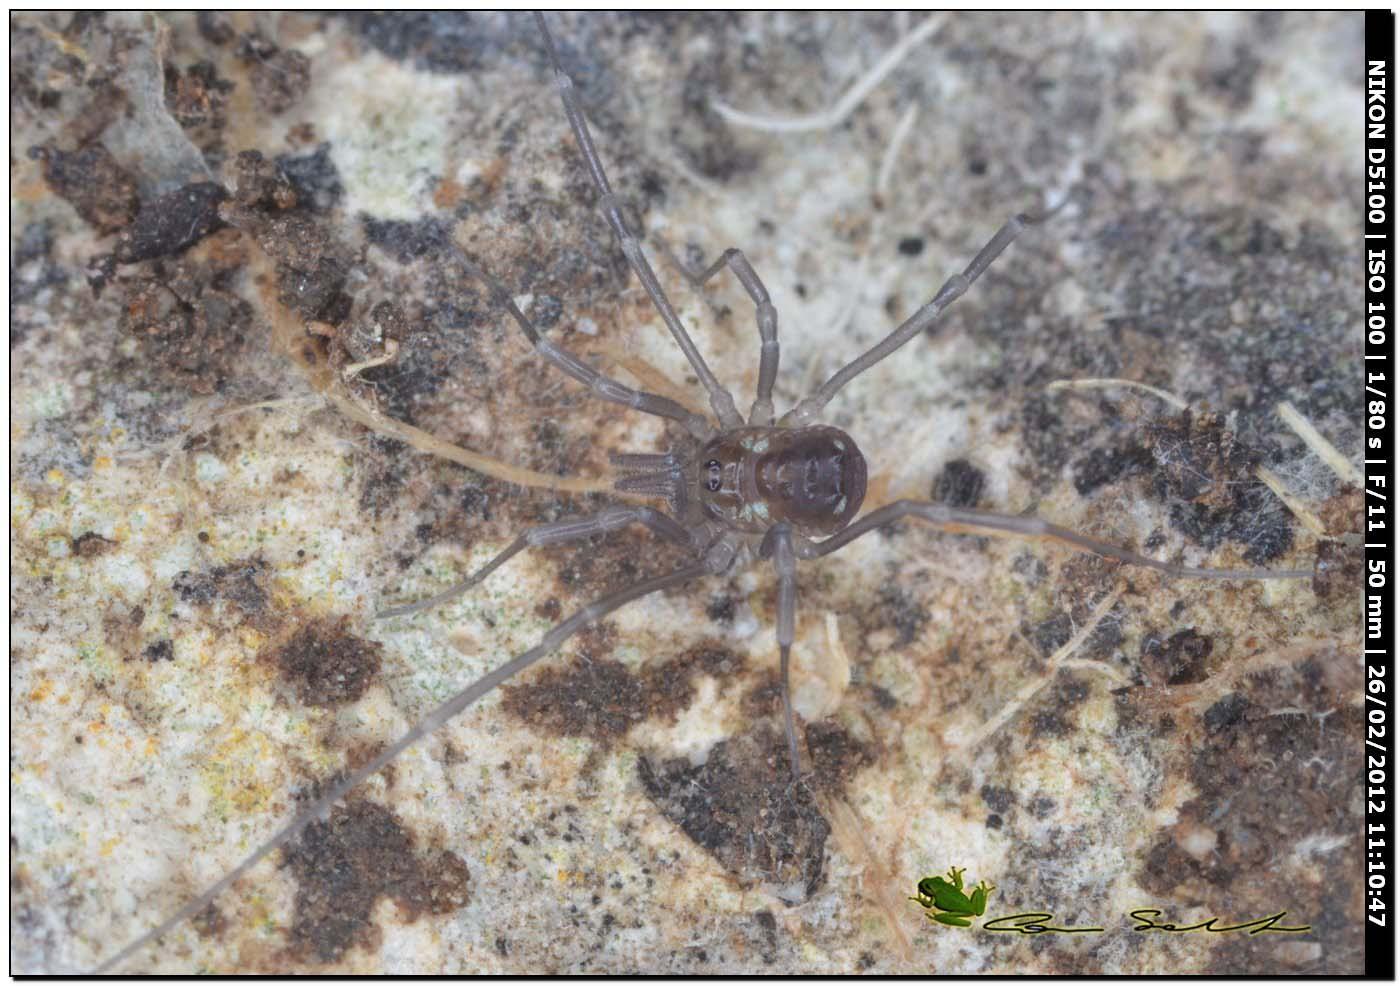 Opilione da Usini 21: Histricostoma argenteolunulatum